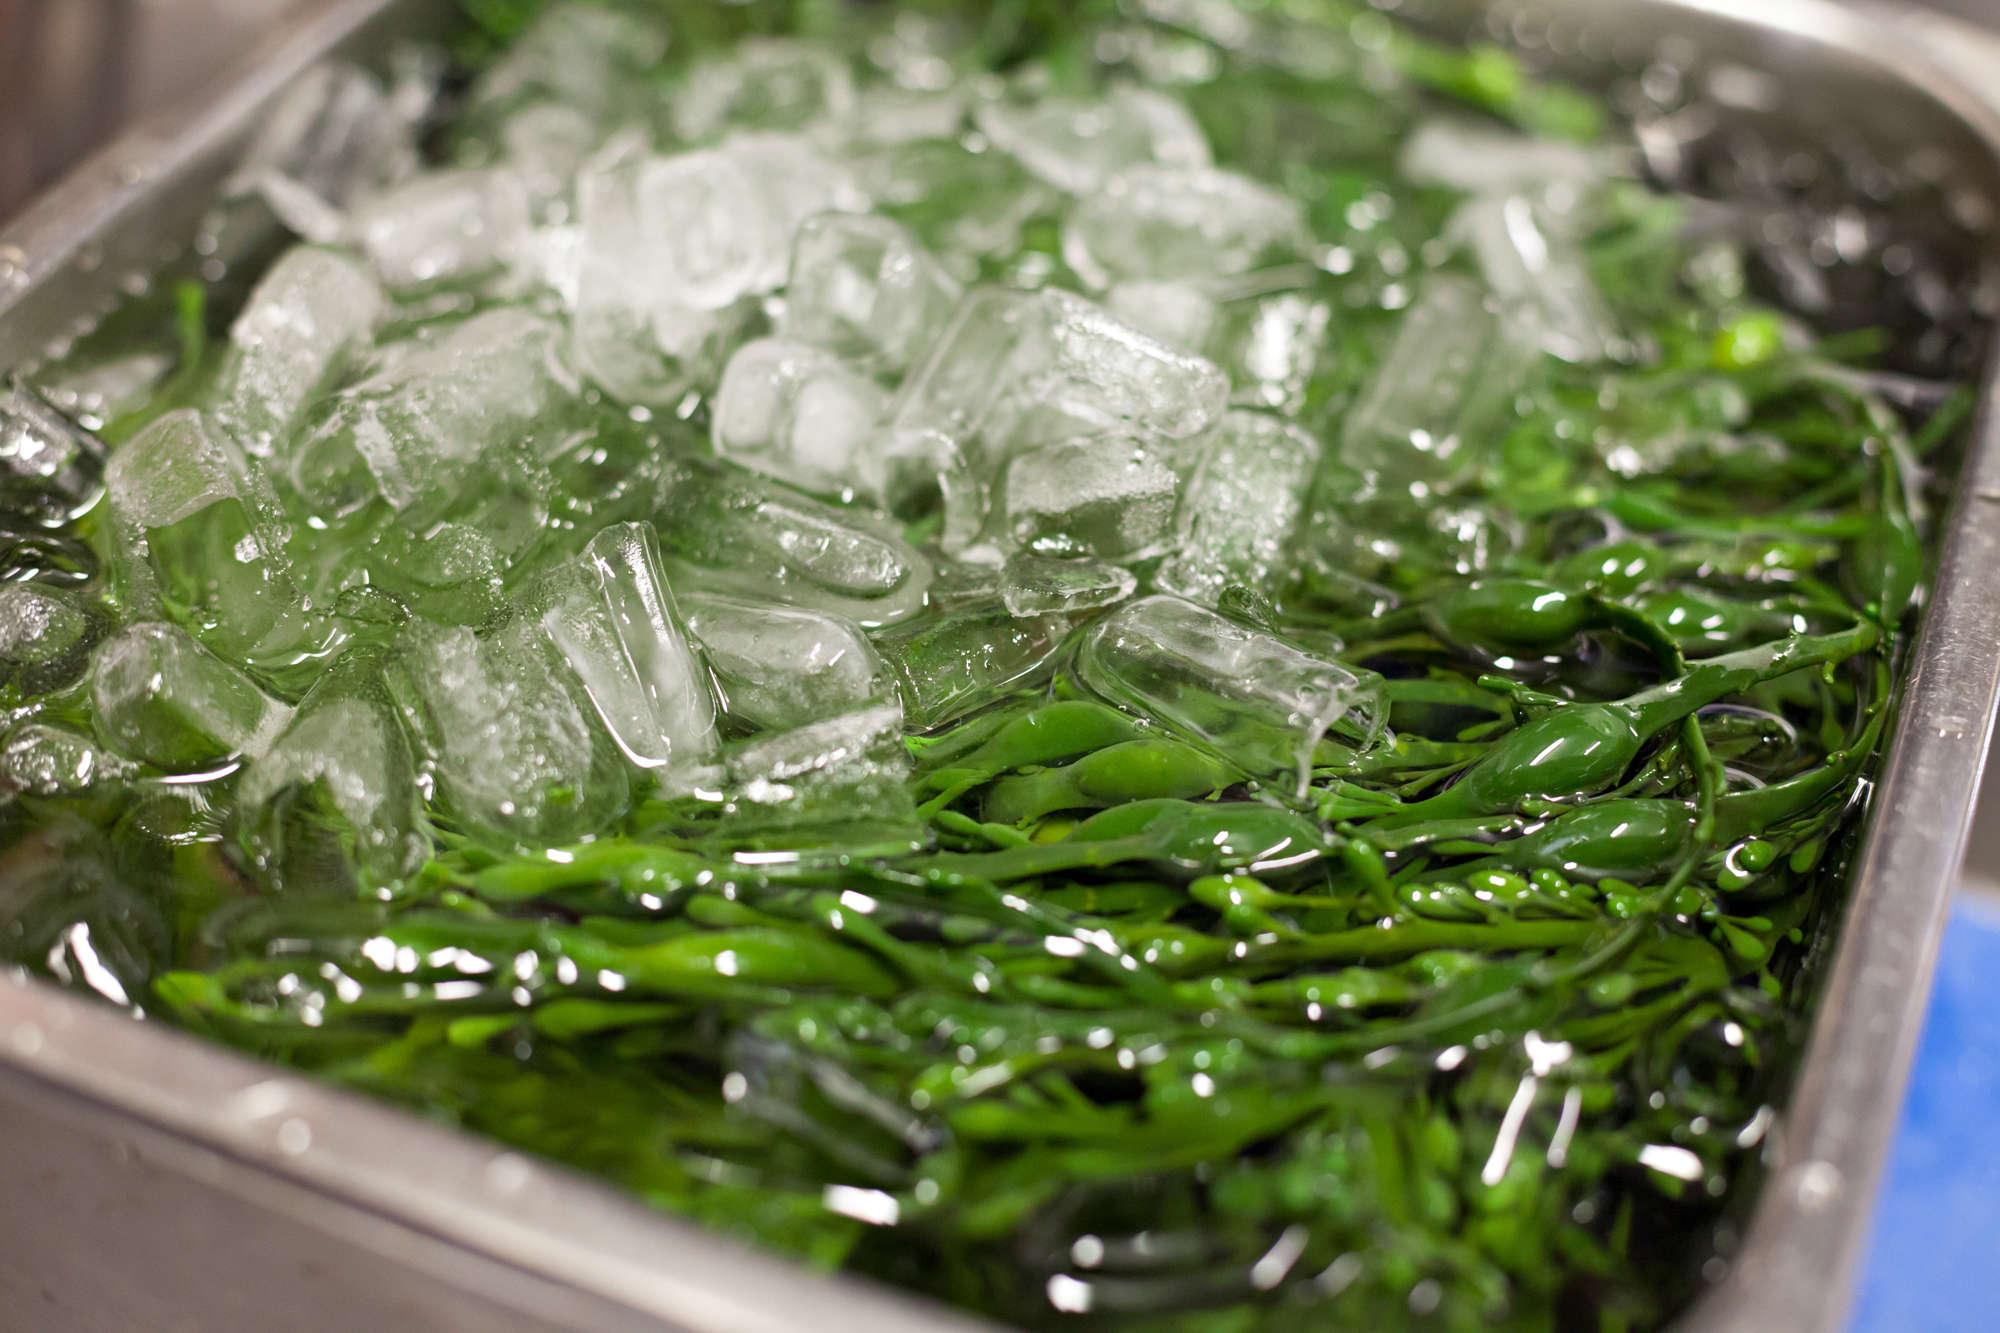 Refreshing Seaweed for Oyster Garnish